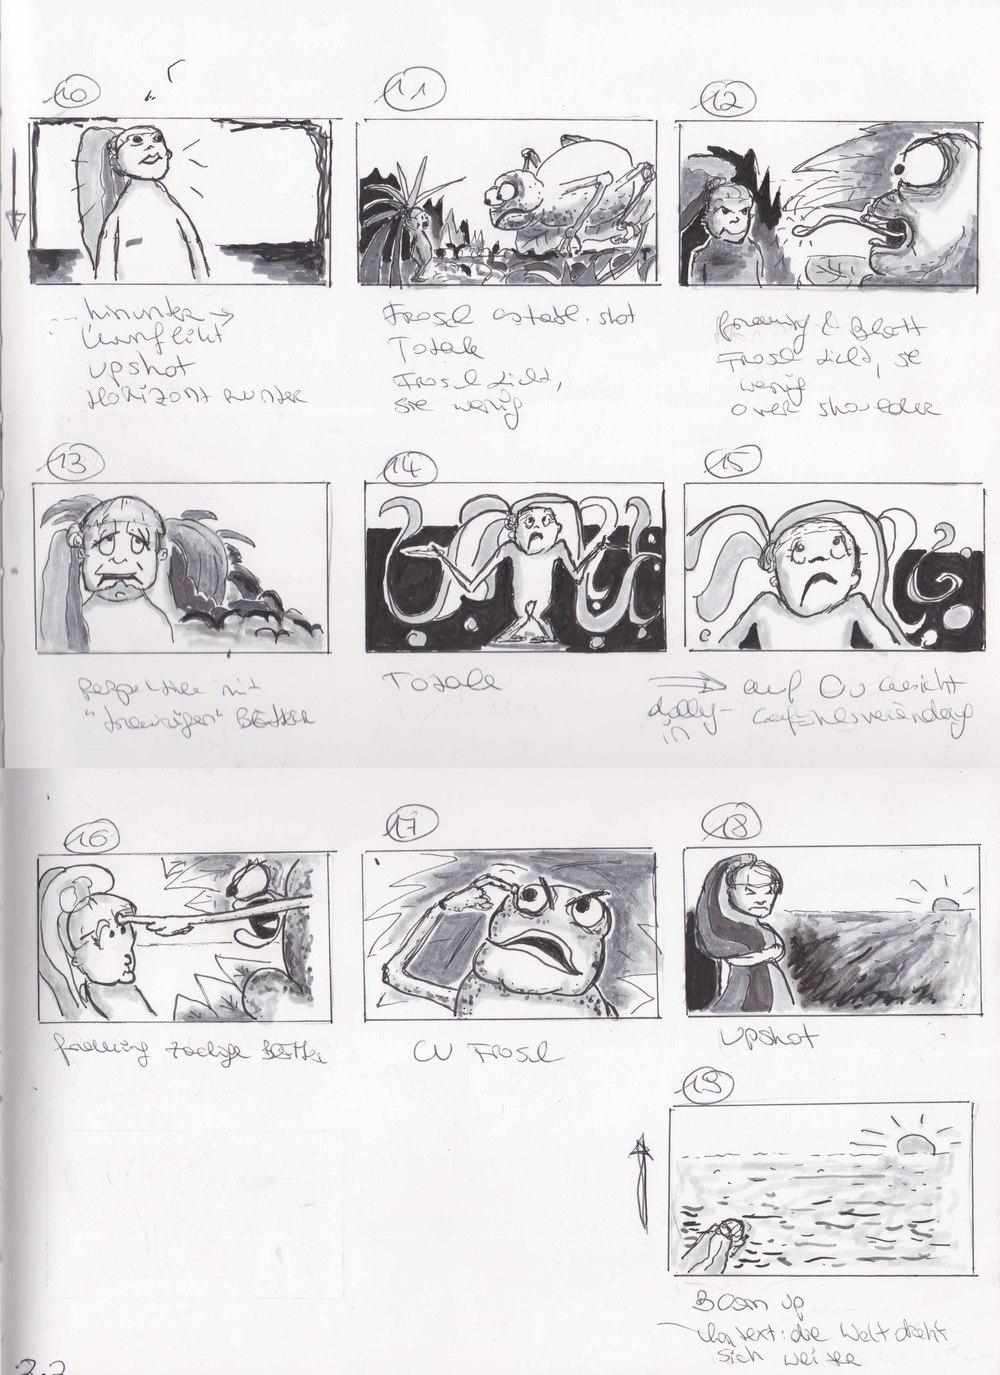 Dollmanits_Storyboard_2_2.jpg